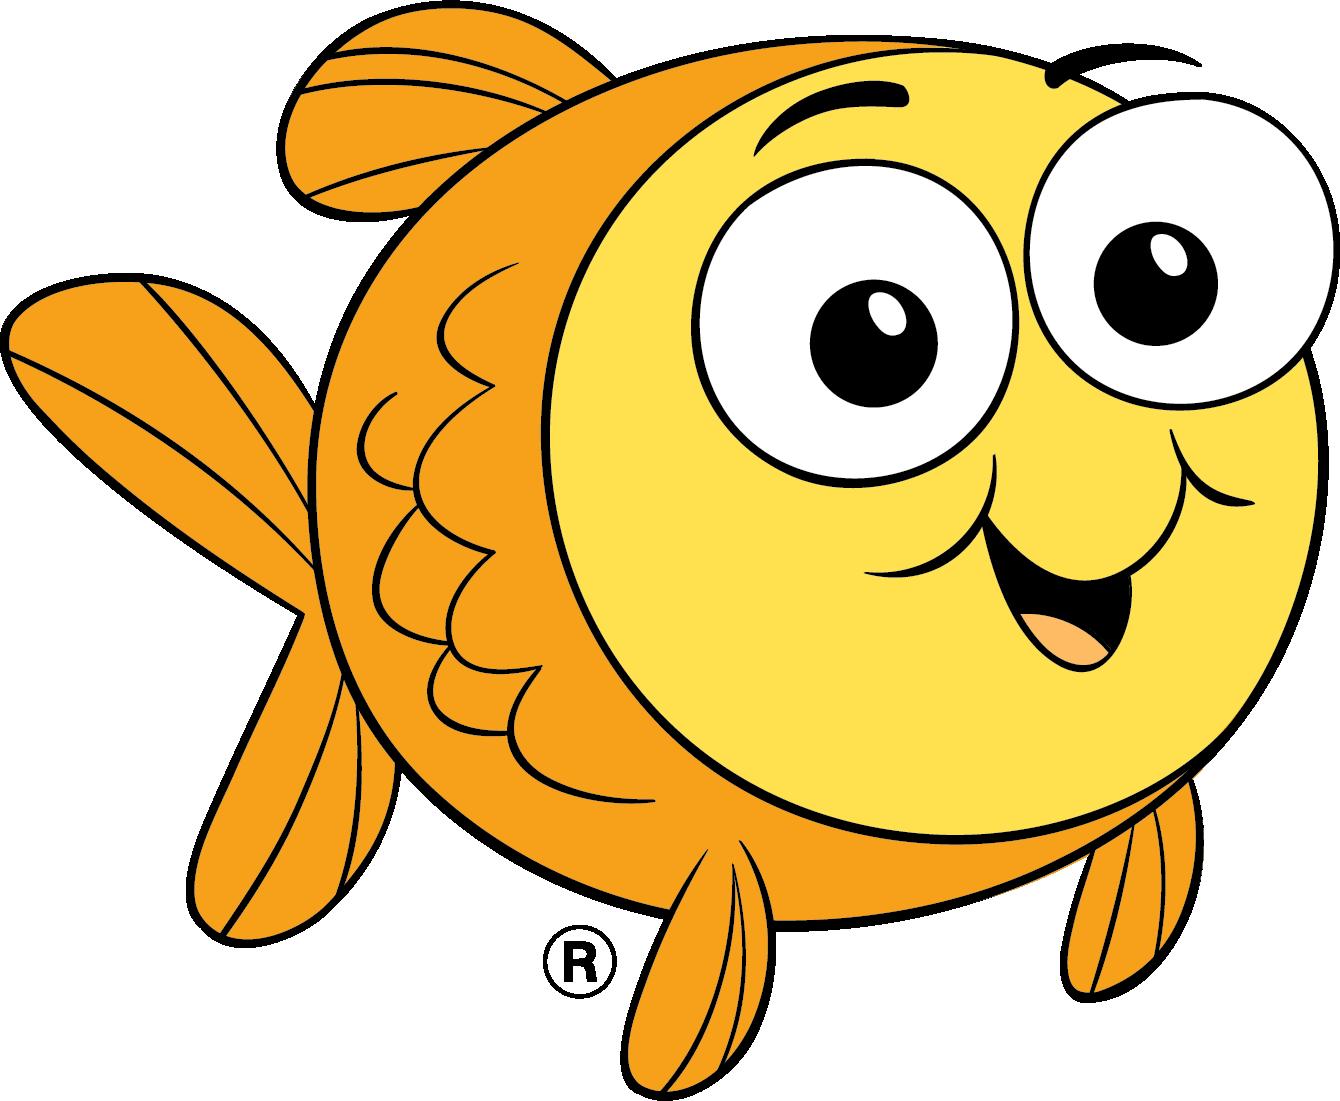 Goldfish clipart attention span. Swim school paul risk